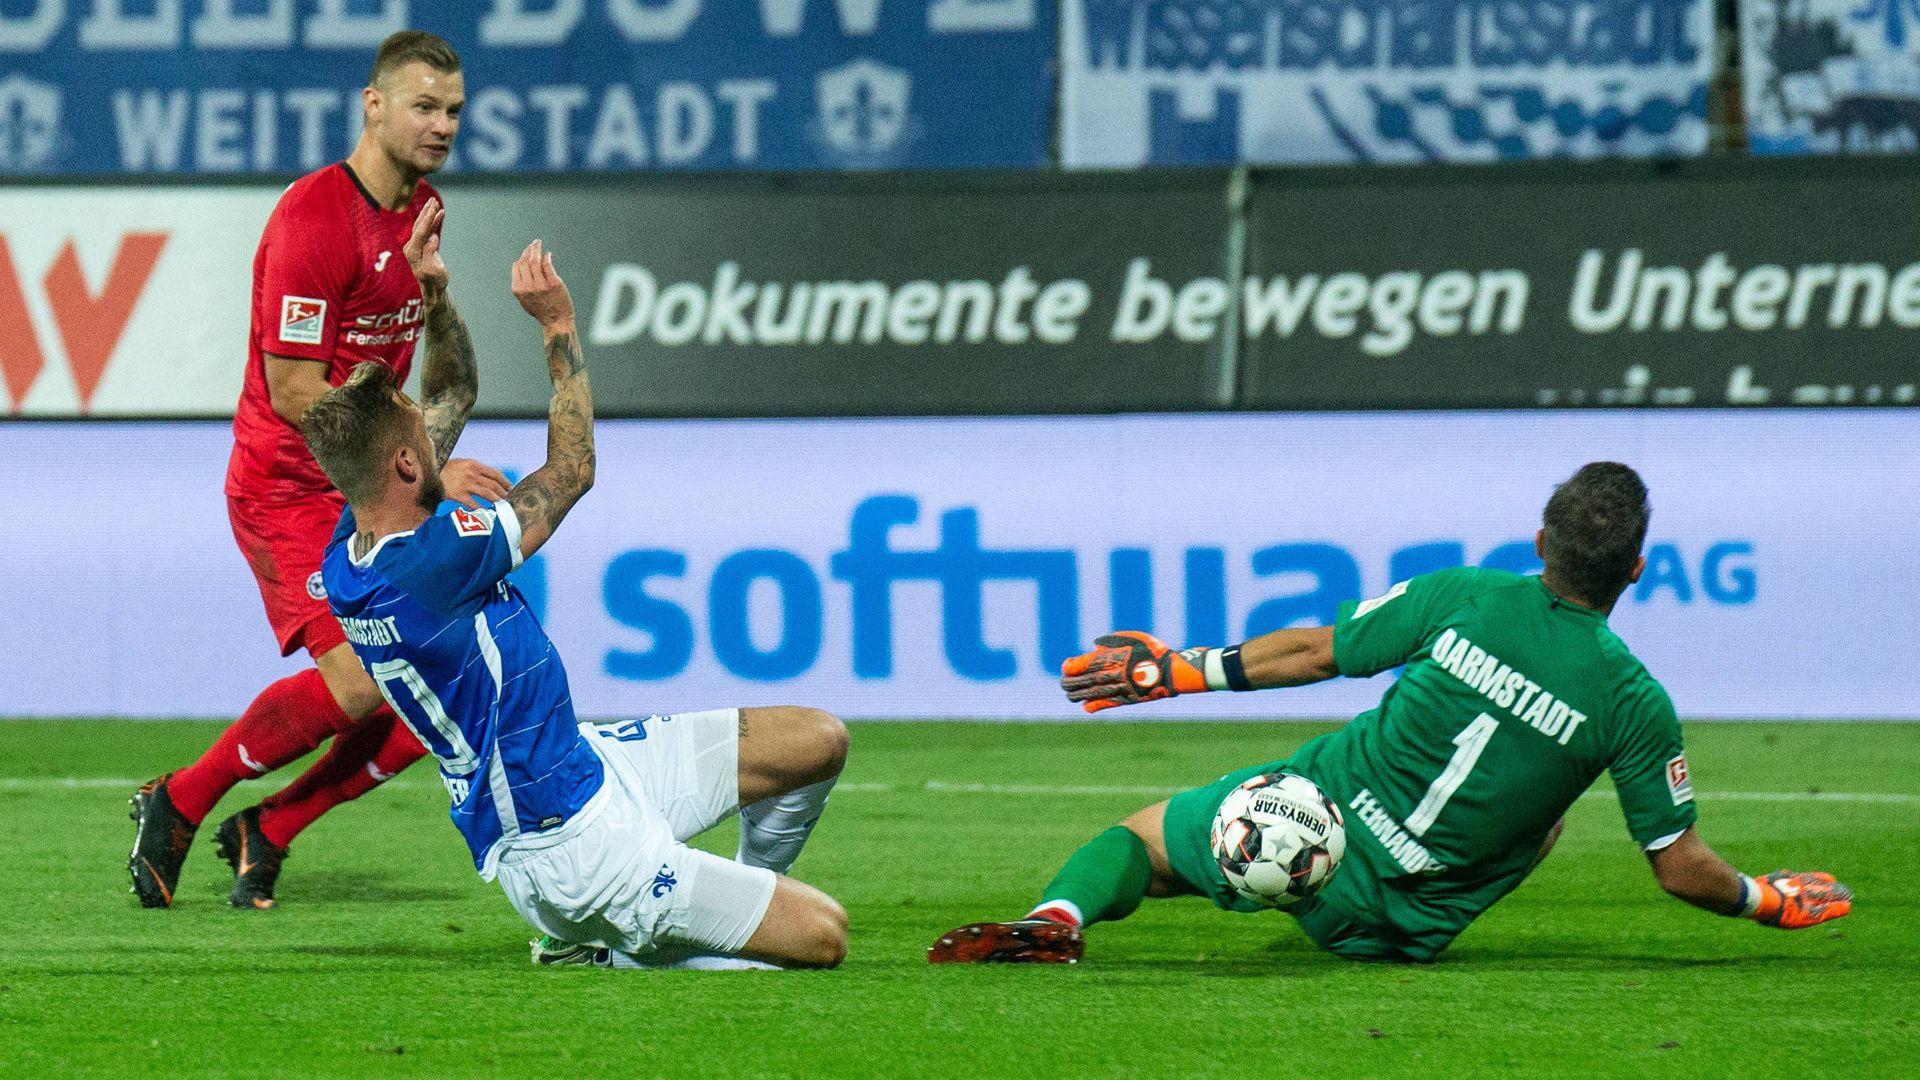 2 Bundesliga Sv Darmstadt 98 Dsc Arminia Bielefeld 2